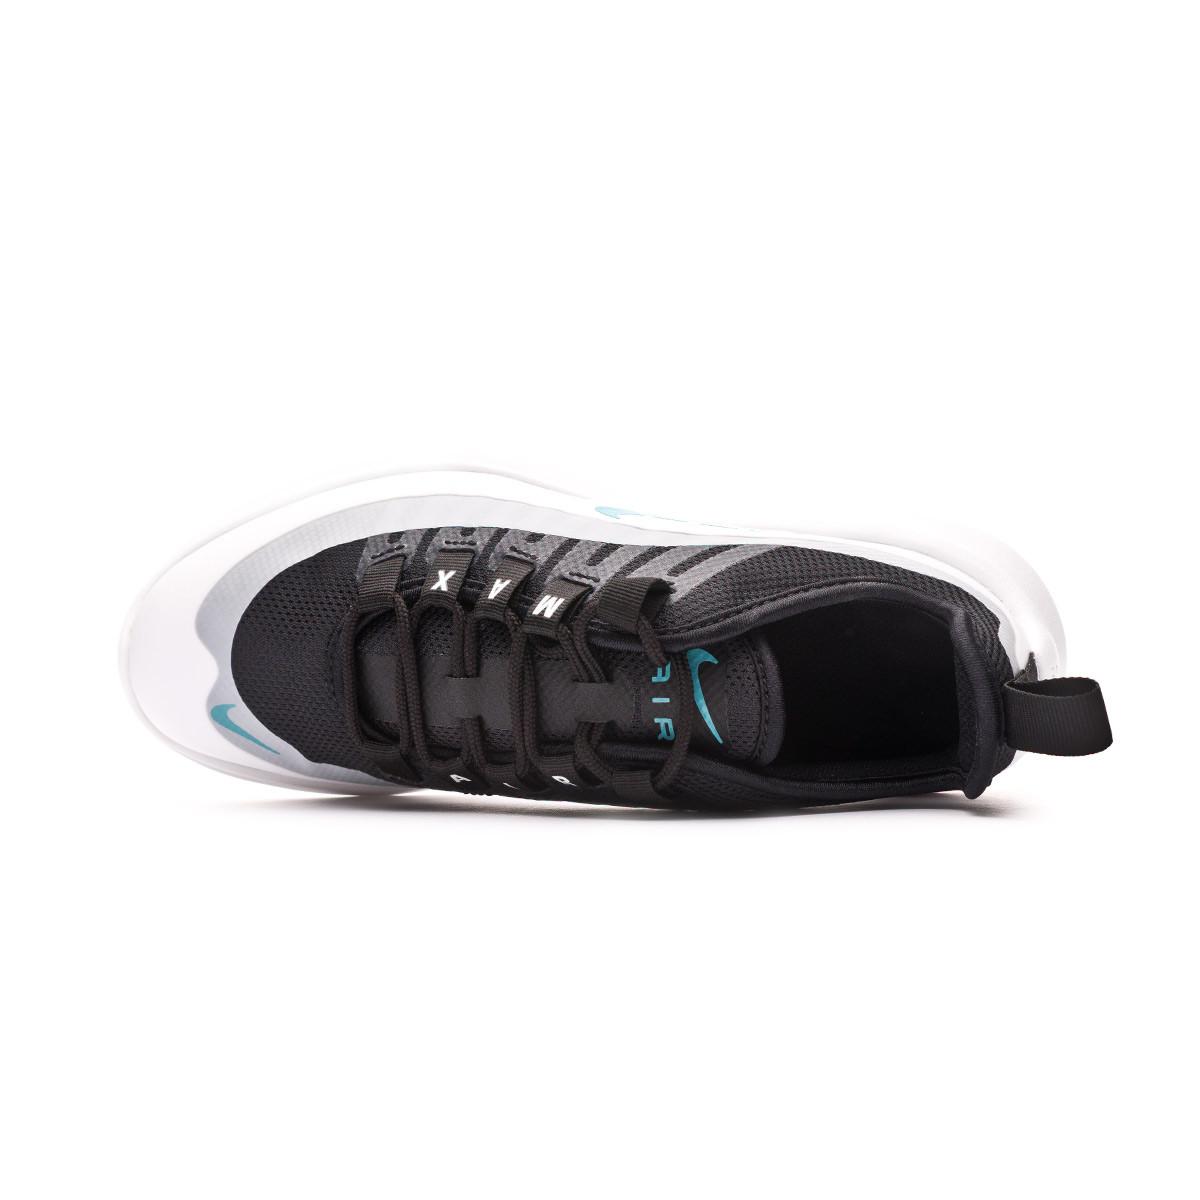 Scarpe Nike Air Max Axis Bambino